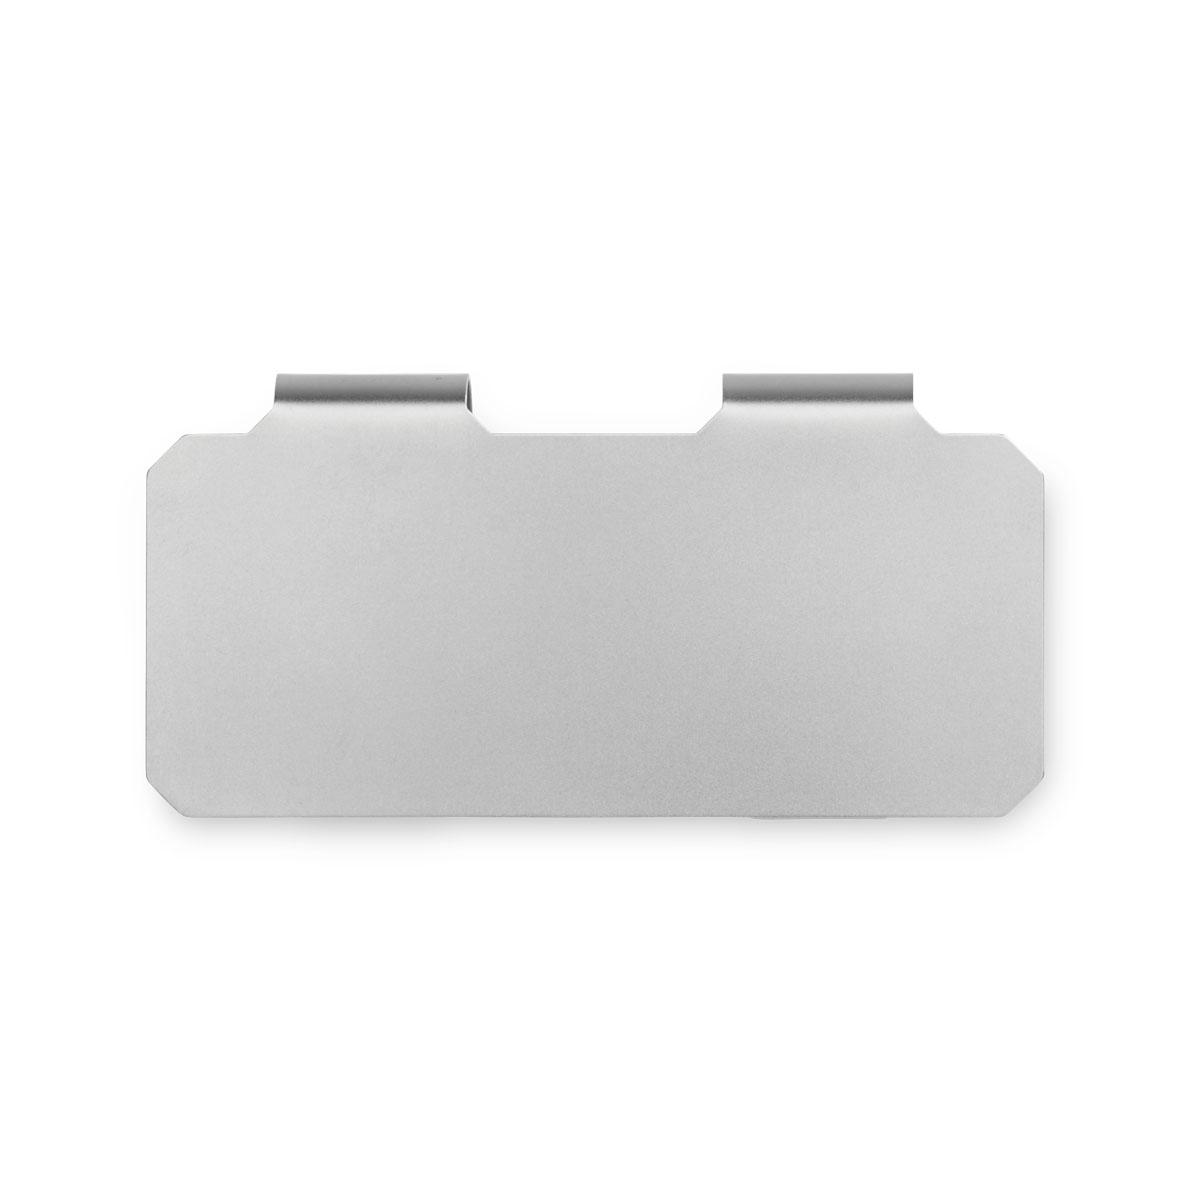 Metal Tray Tag Image